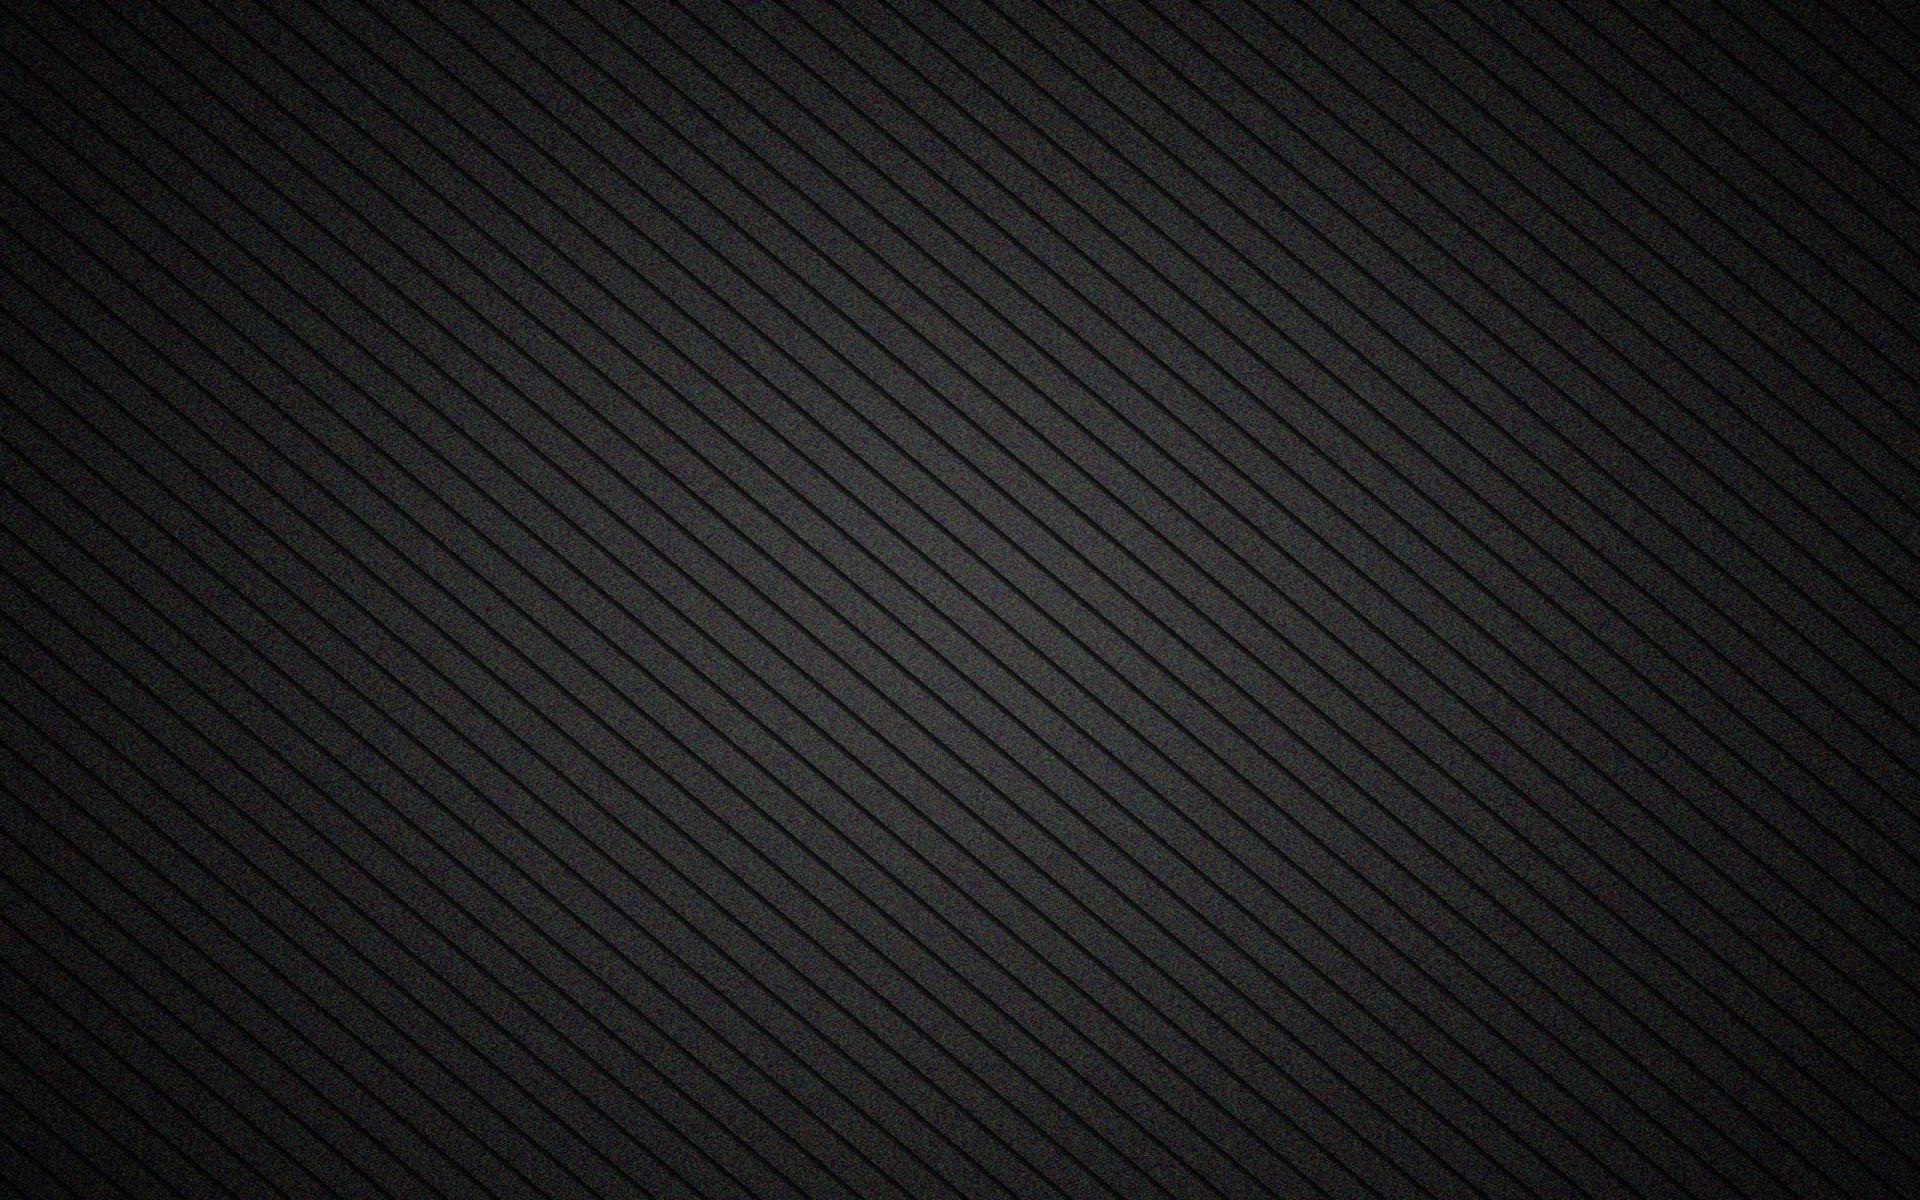 Black Wallpaper 30 1920x1200